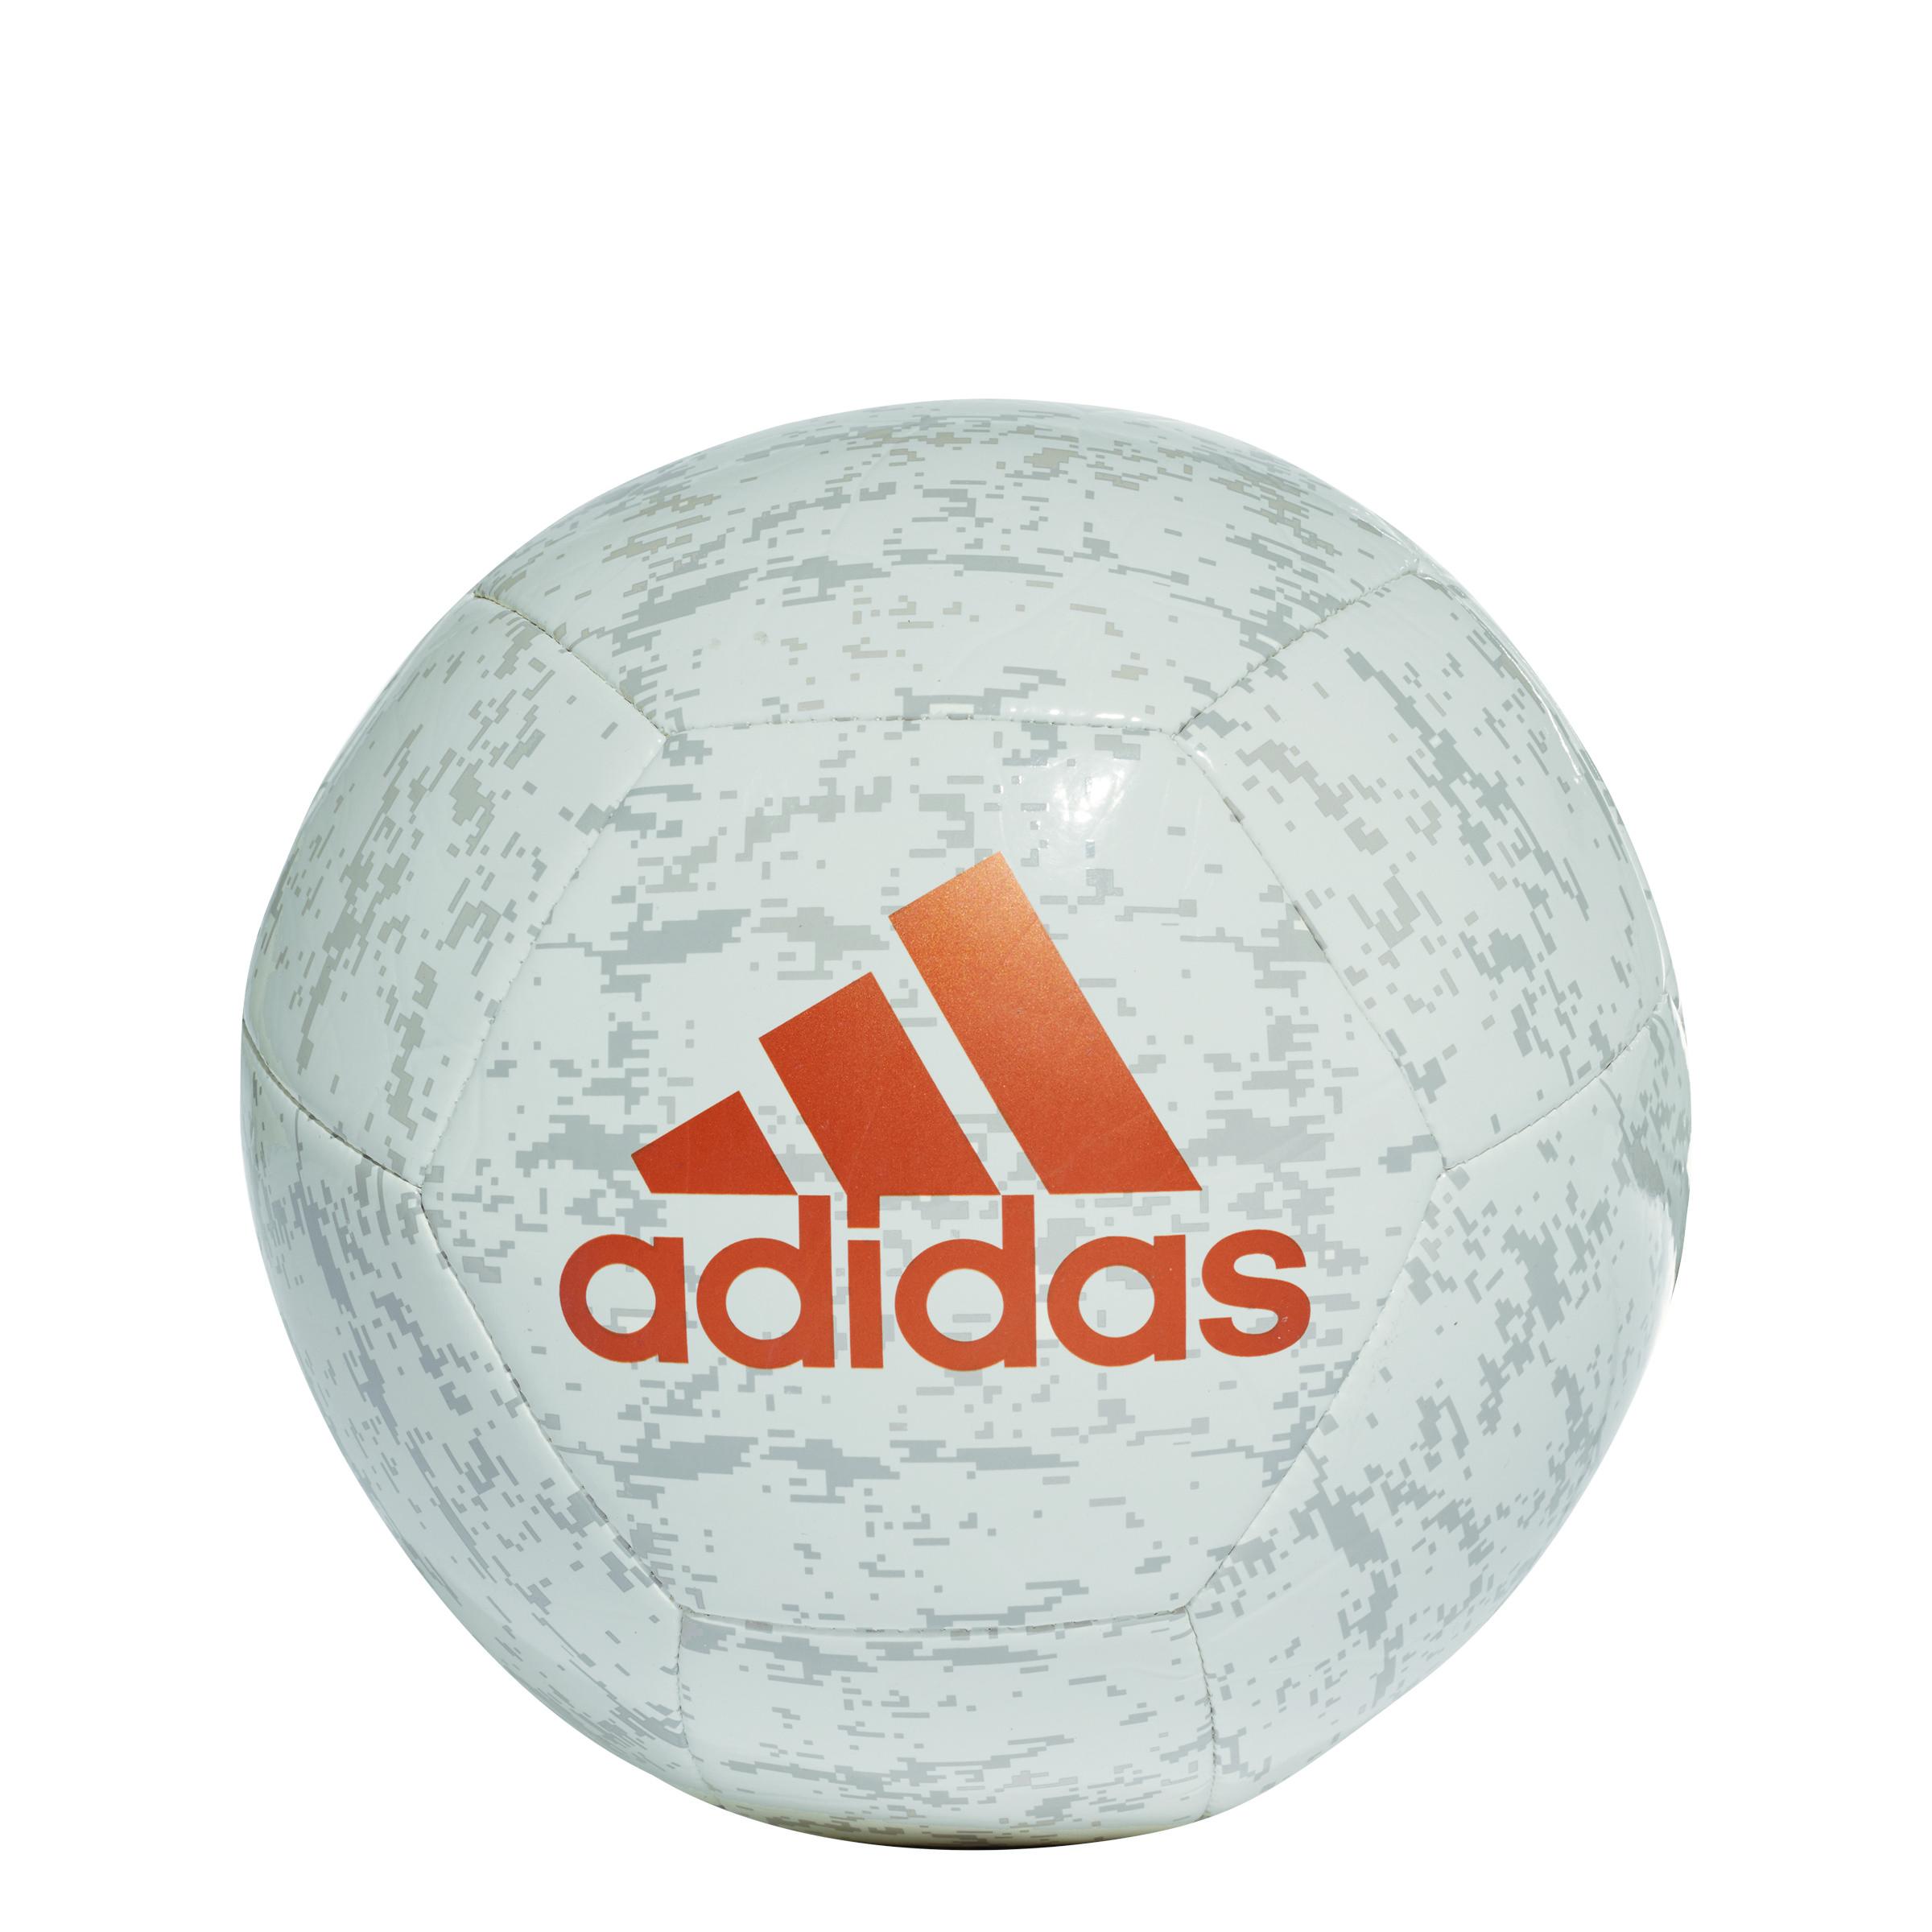 adidas Fussball adidas Glider II CF1217 4